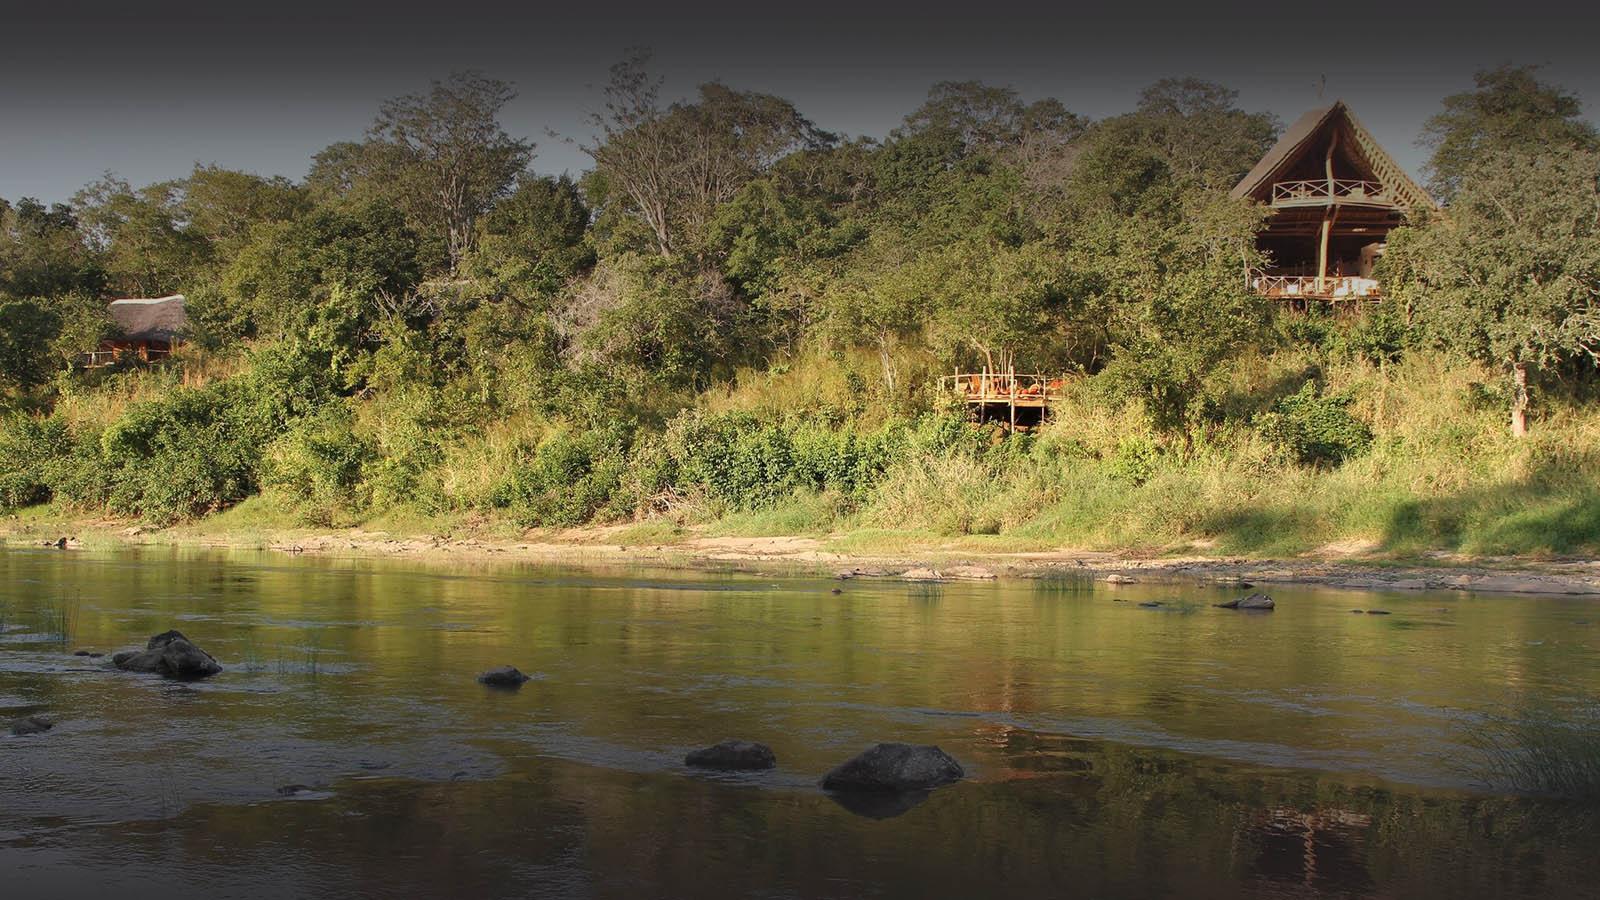 tongole wilderness lodge malawi-lodges-malawian-style-nkhotakota-lodge-river-views